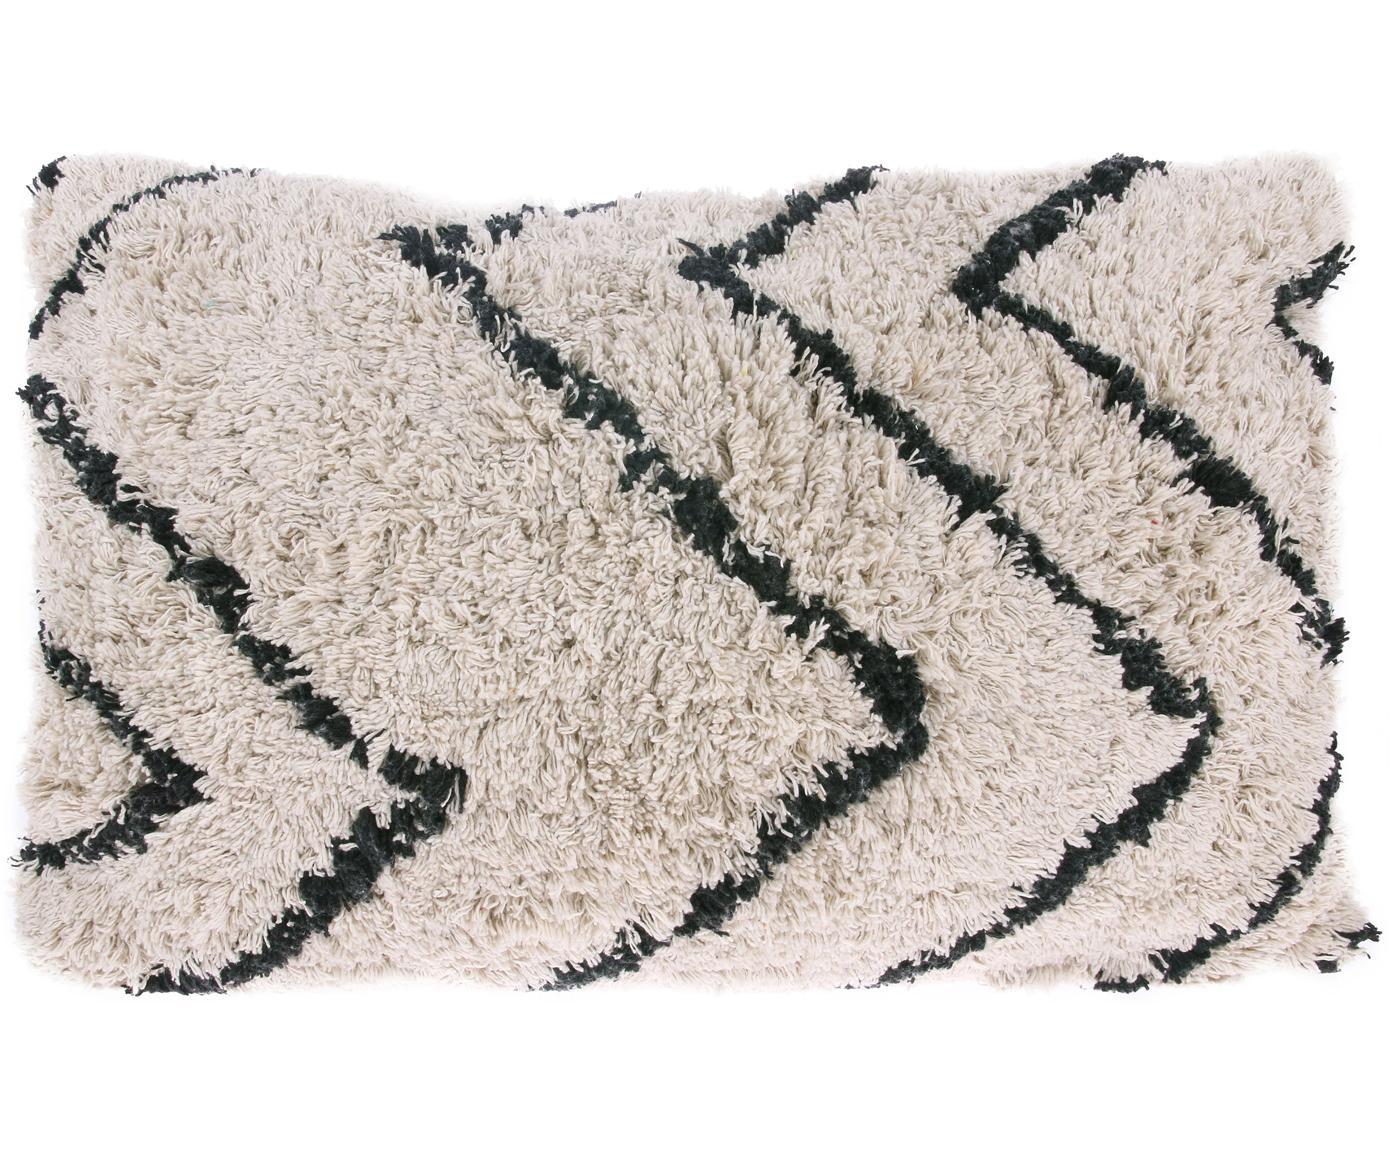 Cuscino fantasia con imbottitura Zigzag, Cotone, Bianco latteo, nero, Larg. 40 x Lung. 60 cm